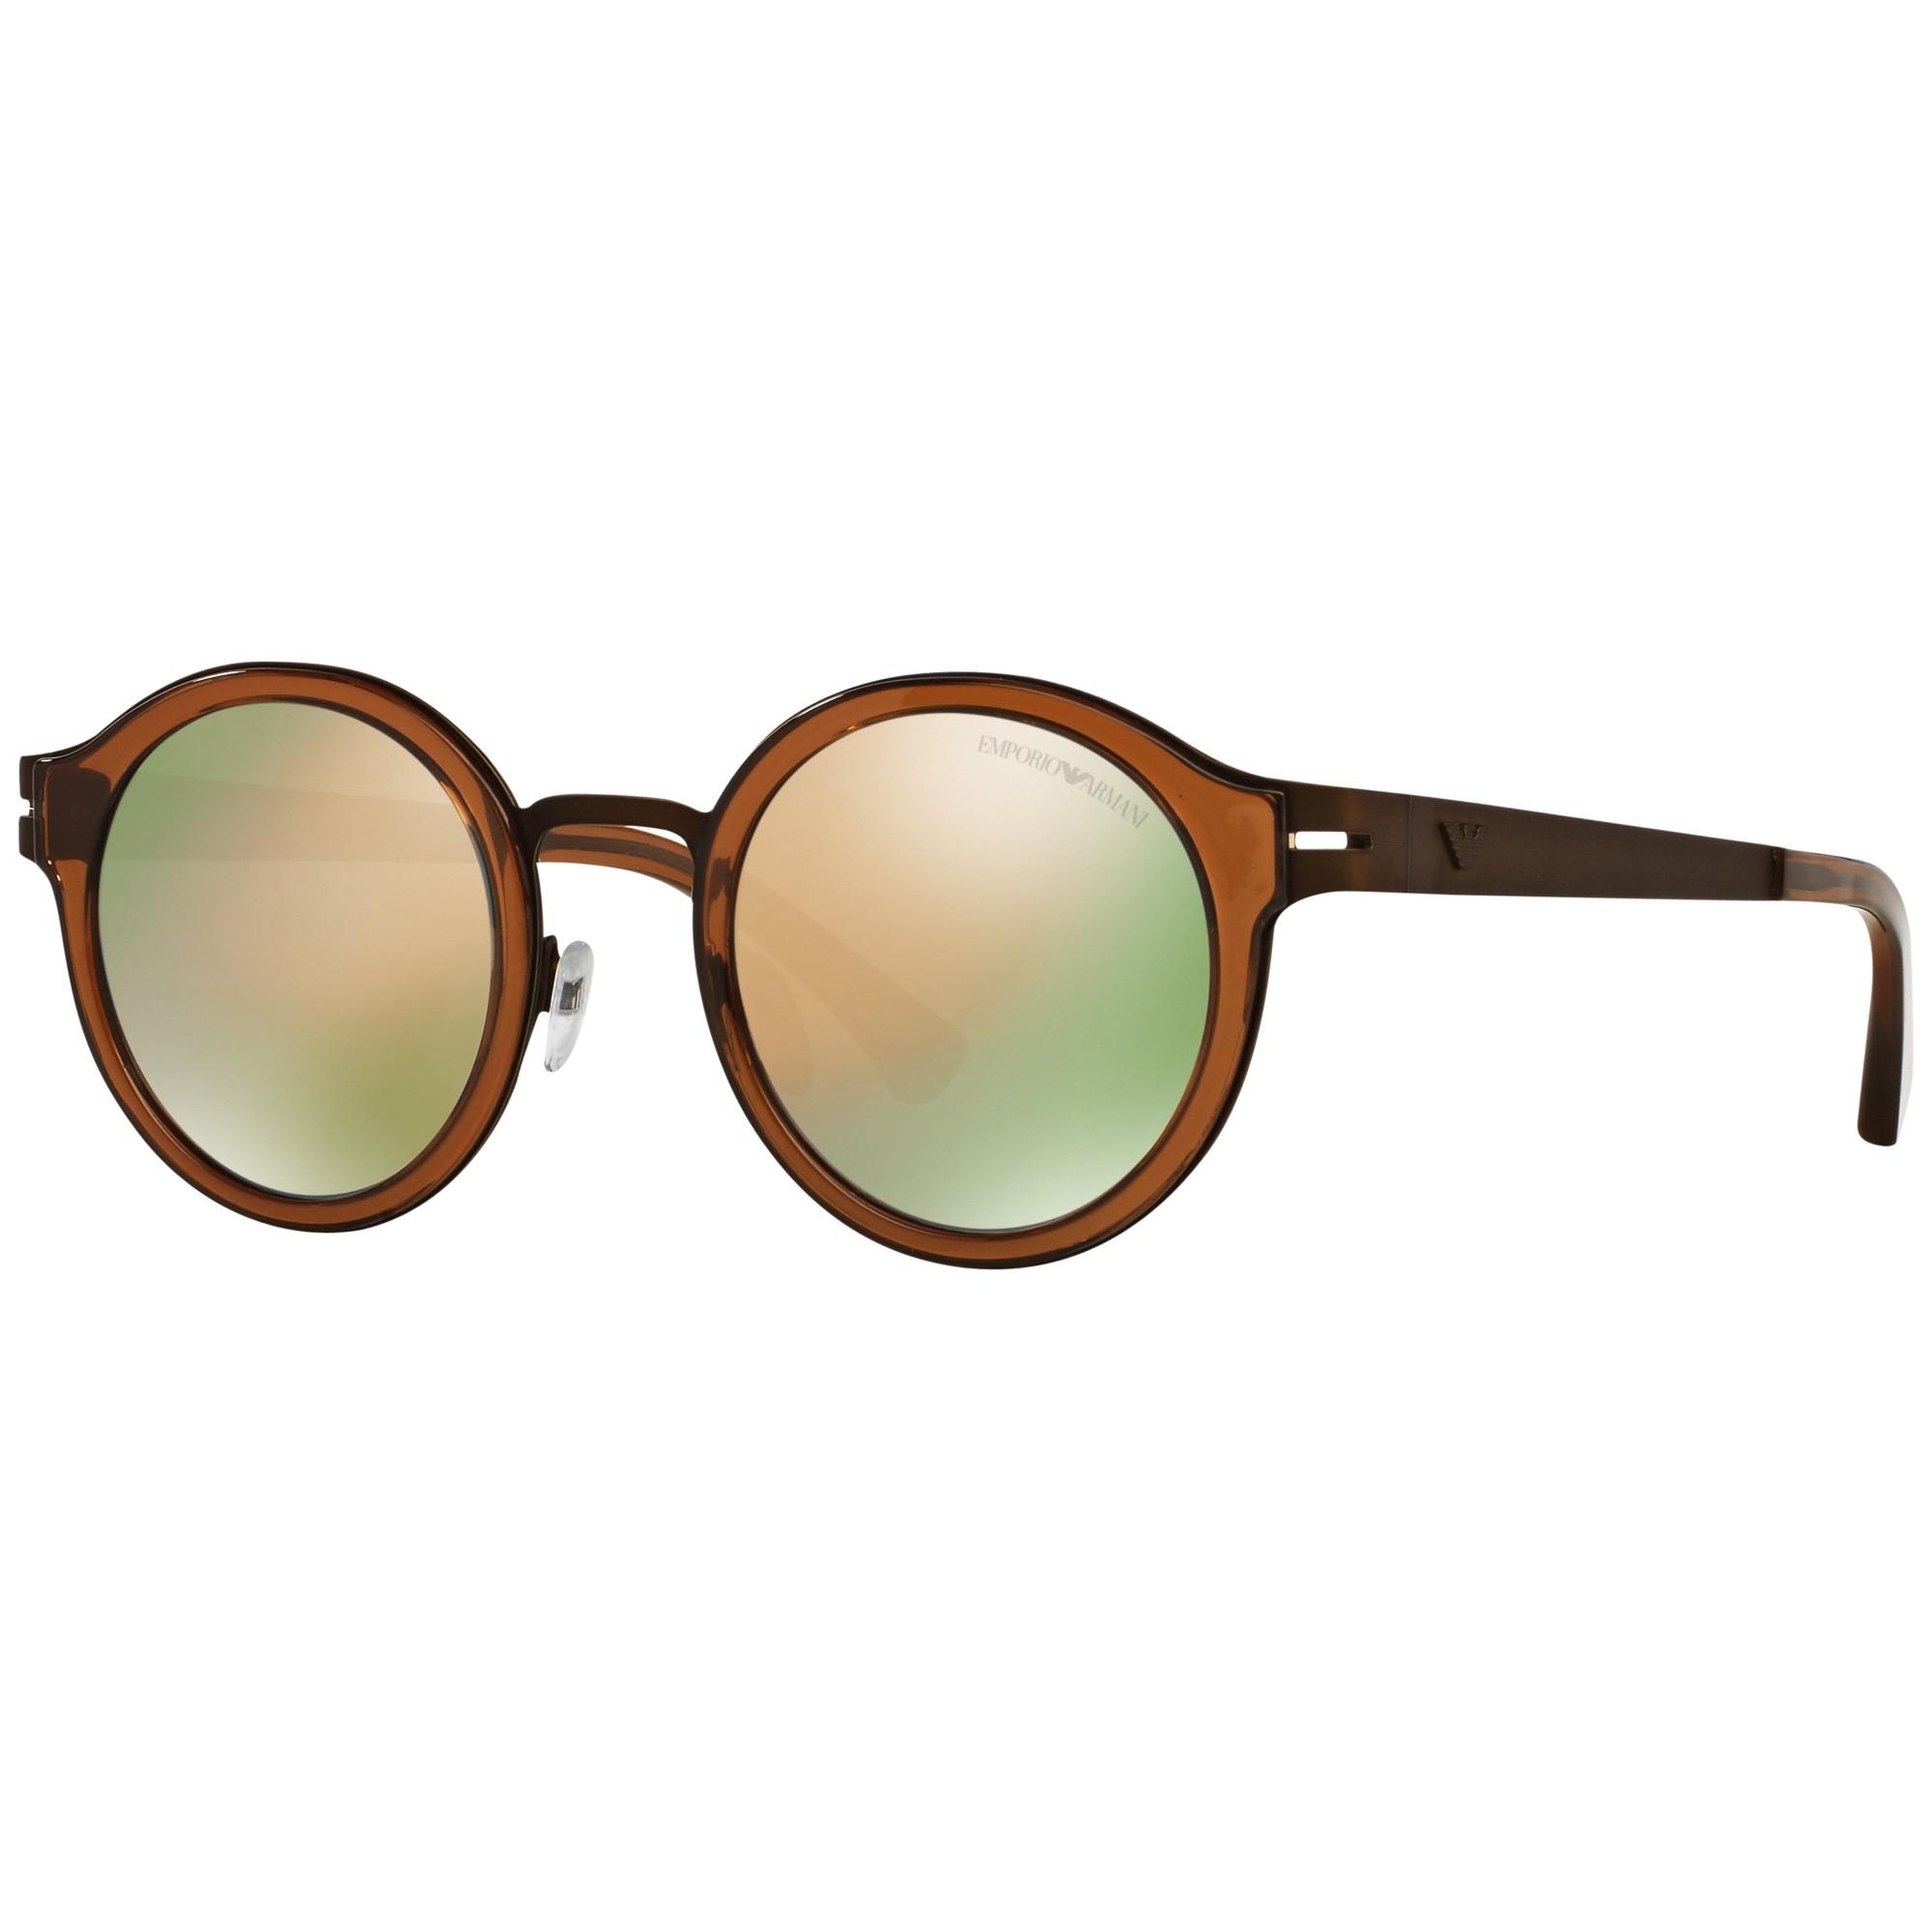 f1c84af07997 Emporio Armani Ea2029 Round Sunglasses in Brown - Lyst